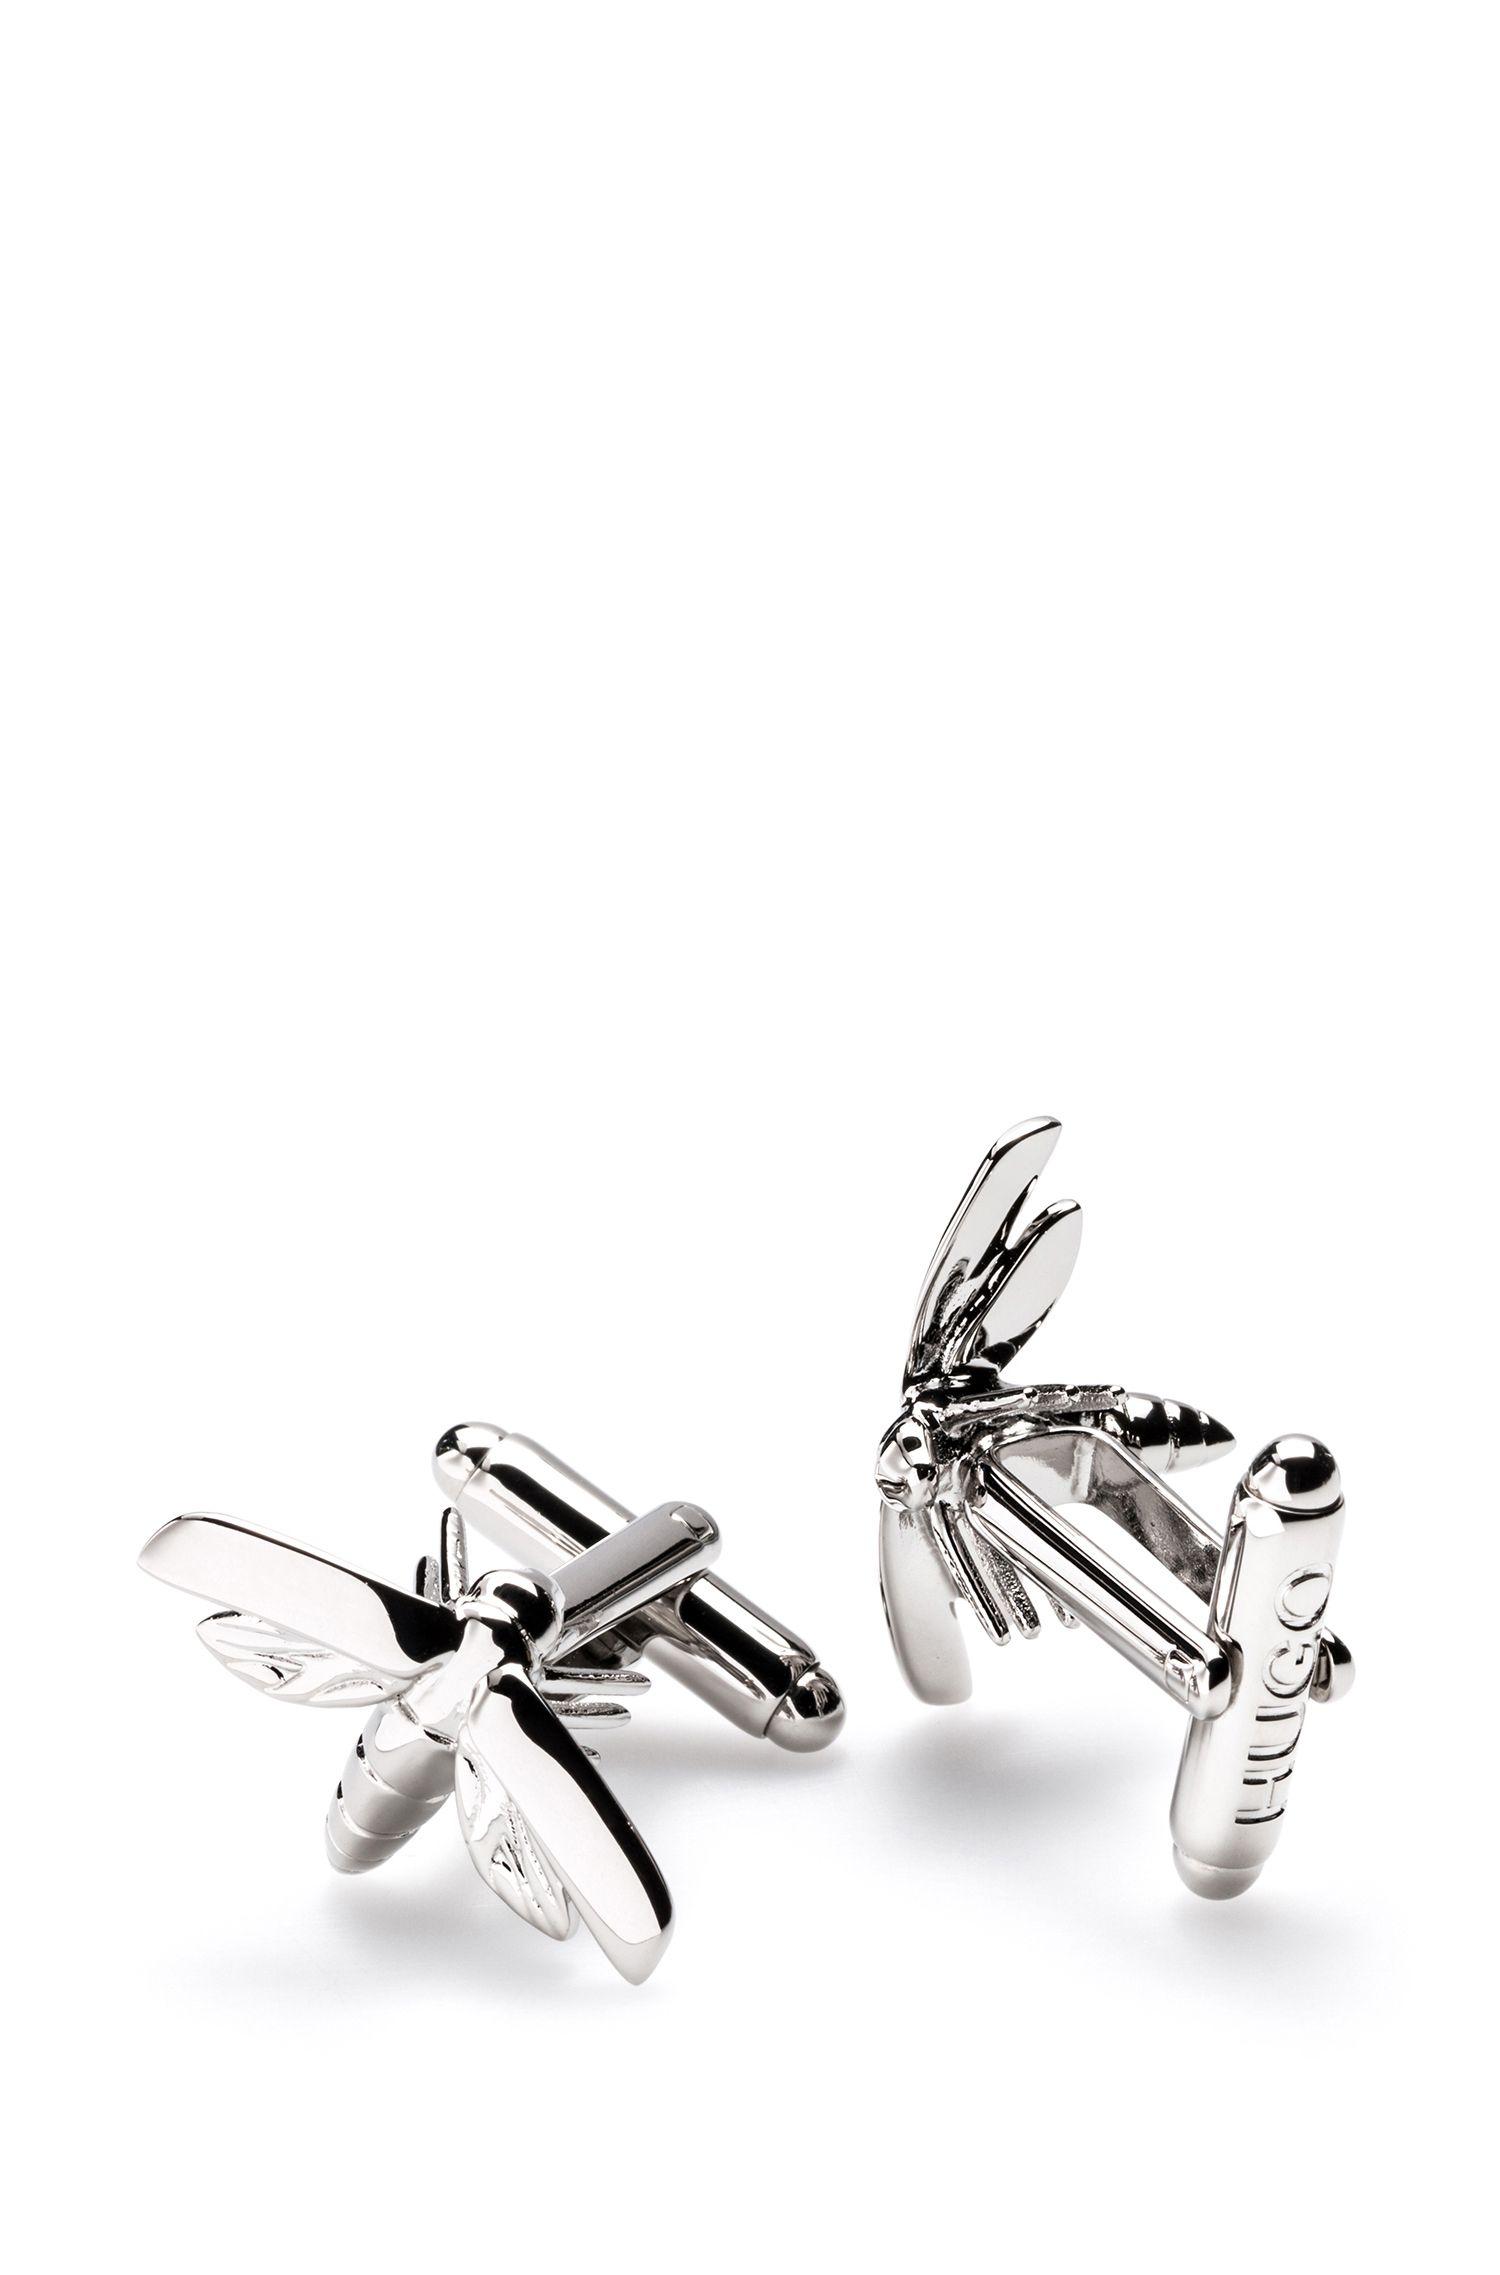 Firefly cufflinks in polished metal